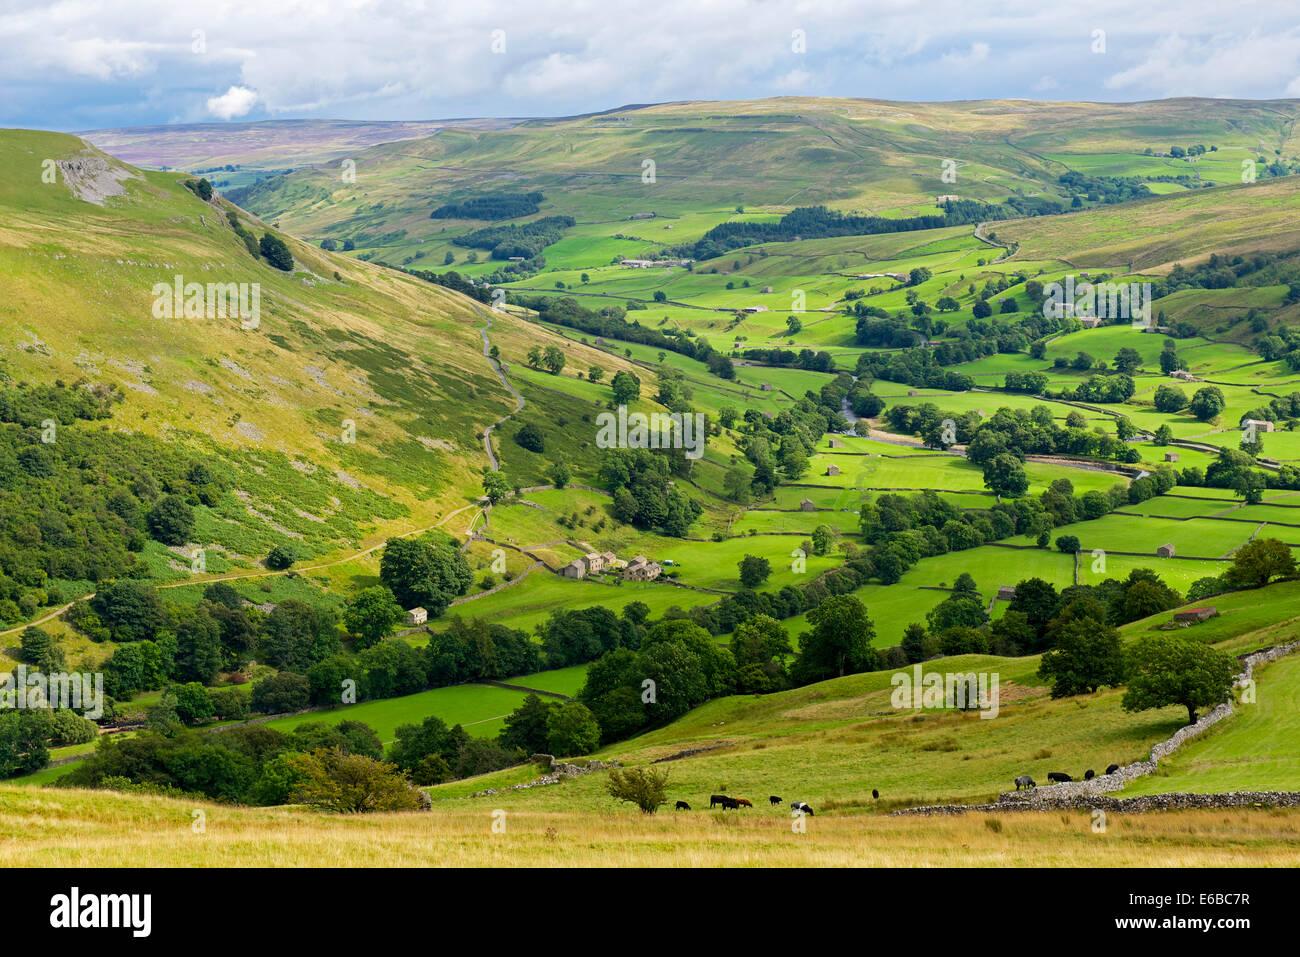 Upper Swaledale from Kisdon Hill, Yorkshire Dales National Park, North Yorkshire, England UK - Stock Image